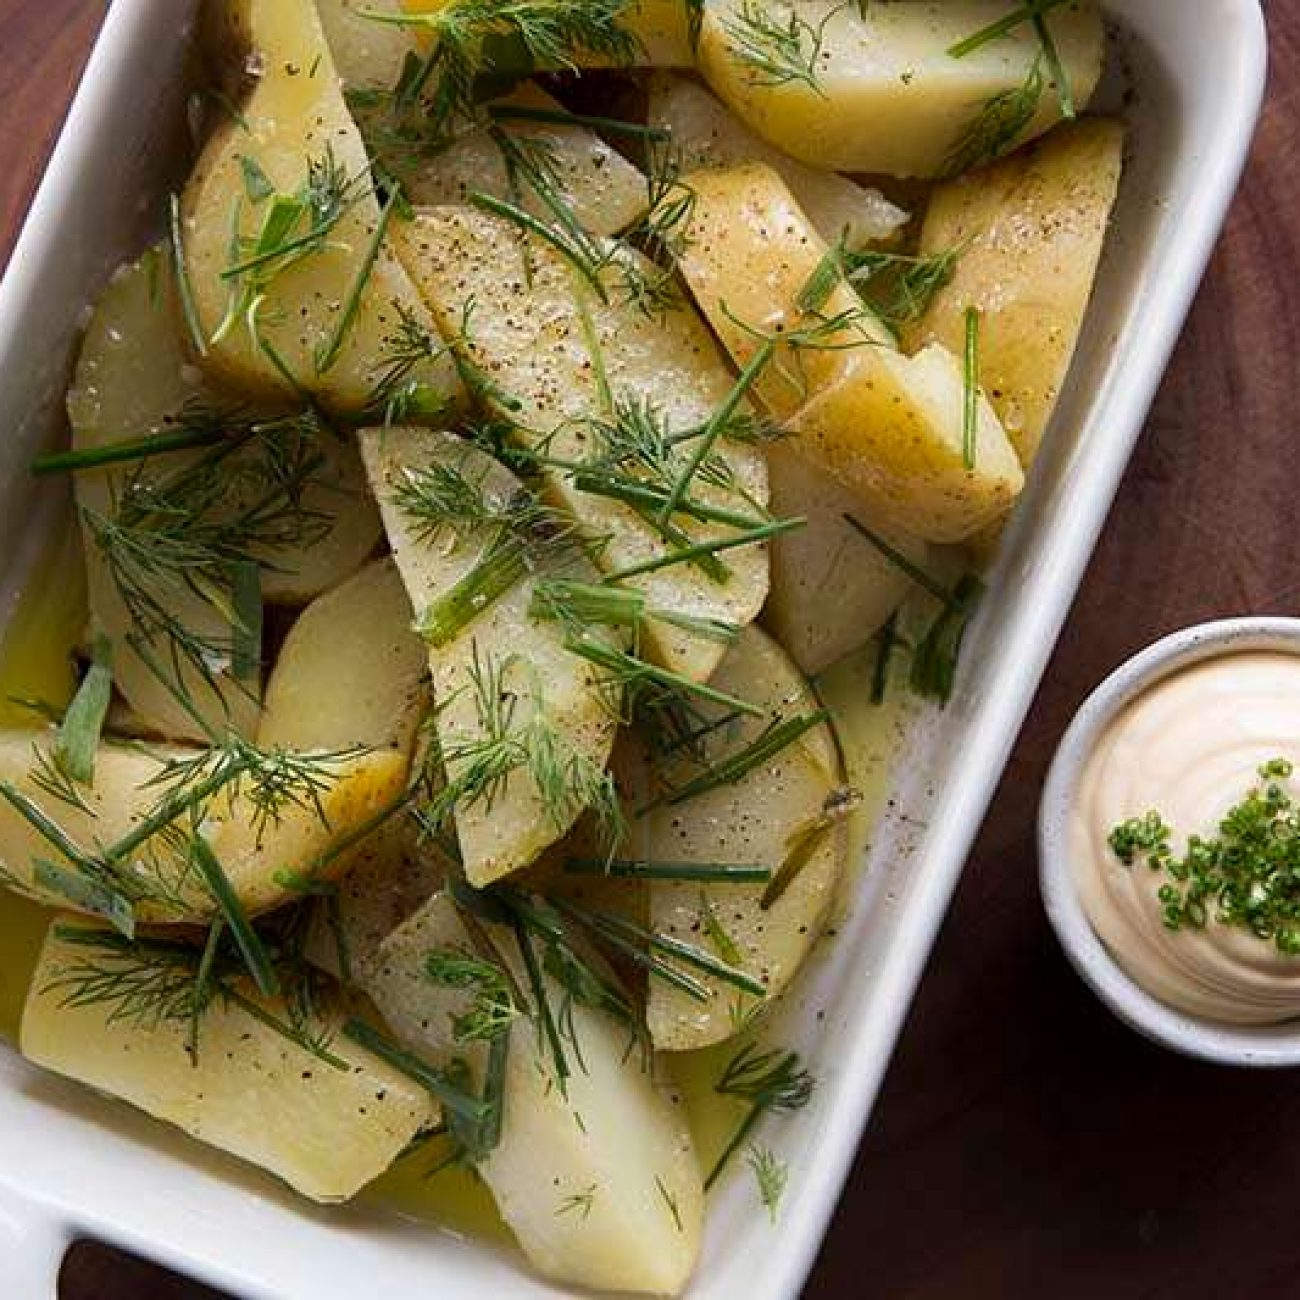 Gold Yukon brambory připravené sous vide